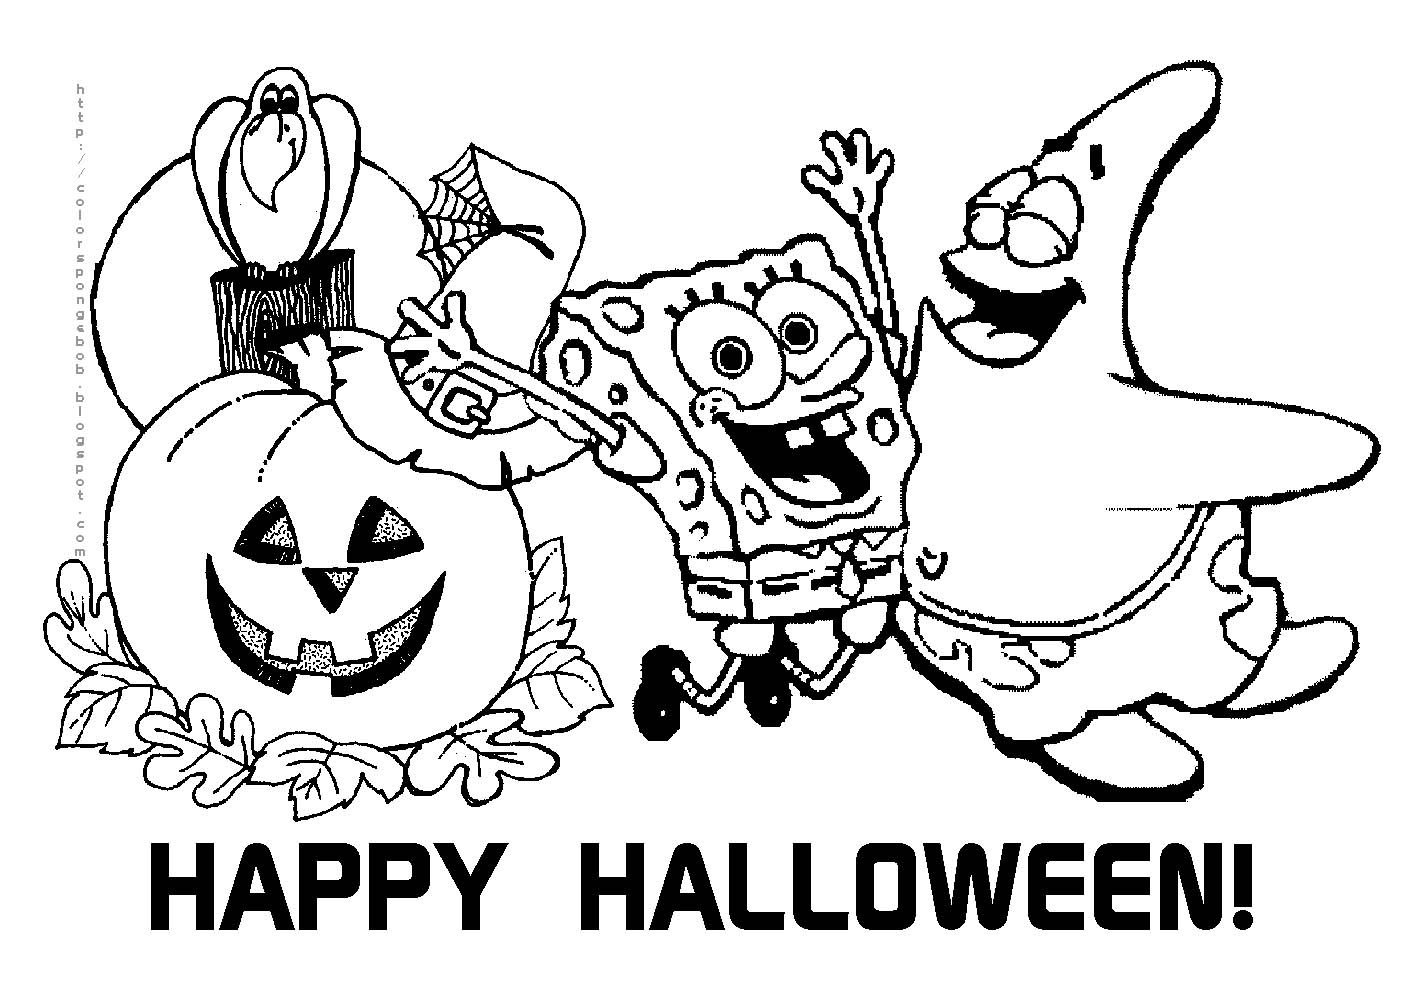 Free Printable Halloween Calendar | Halloween Spongebob Squarepants - Free Printable Halloween Coloring Pages